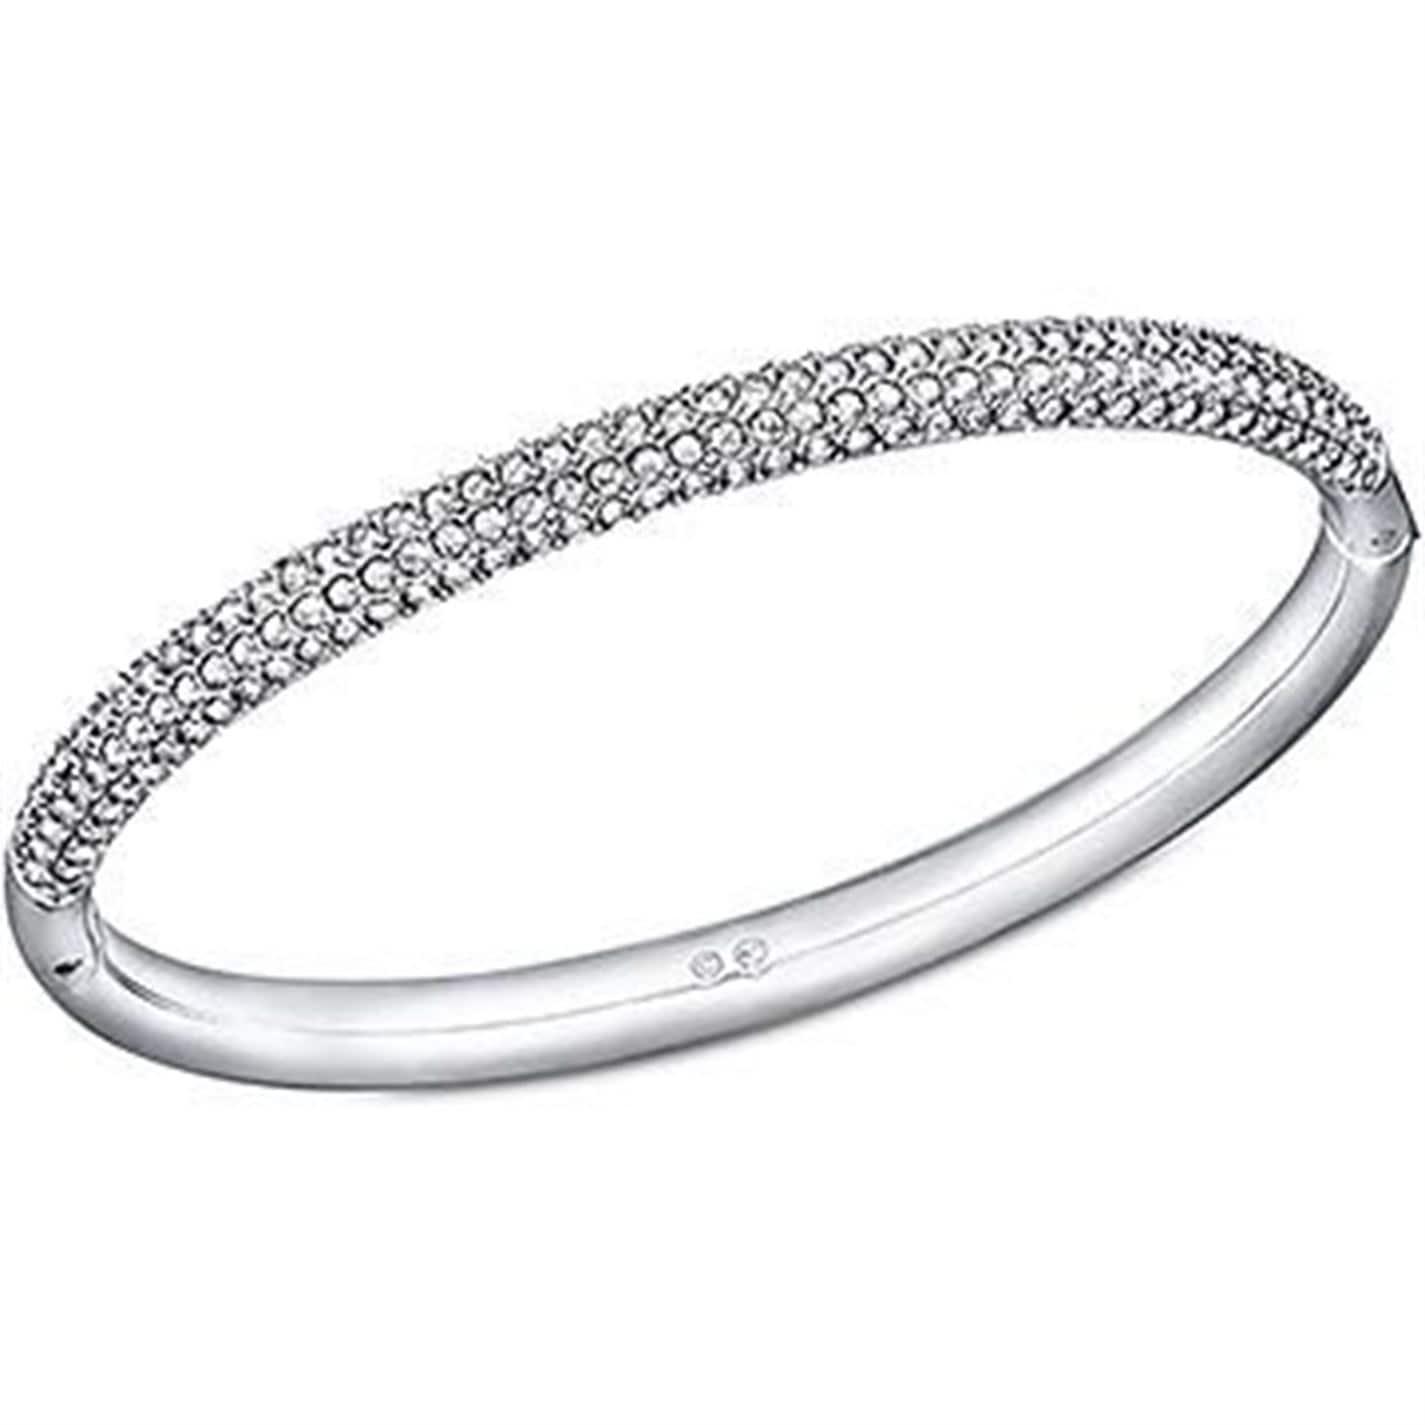 Swarovski Stone Mini Crystal Bangle in Silver (Metallic)